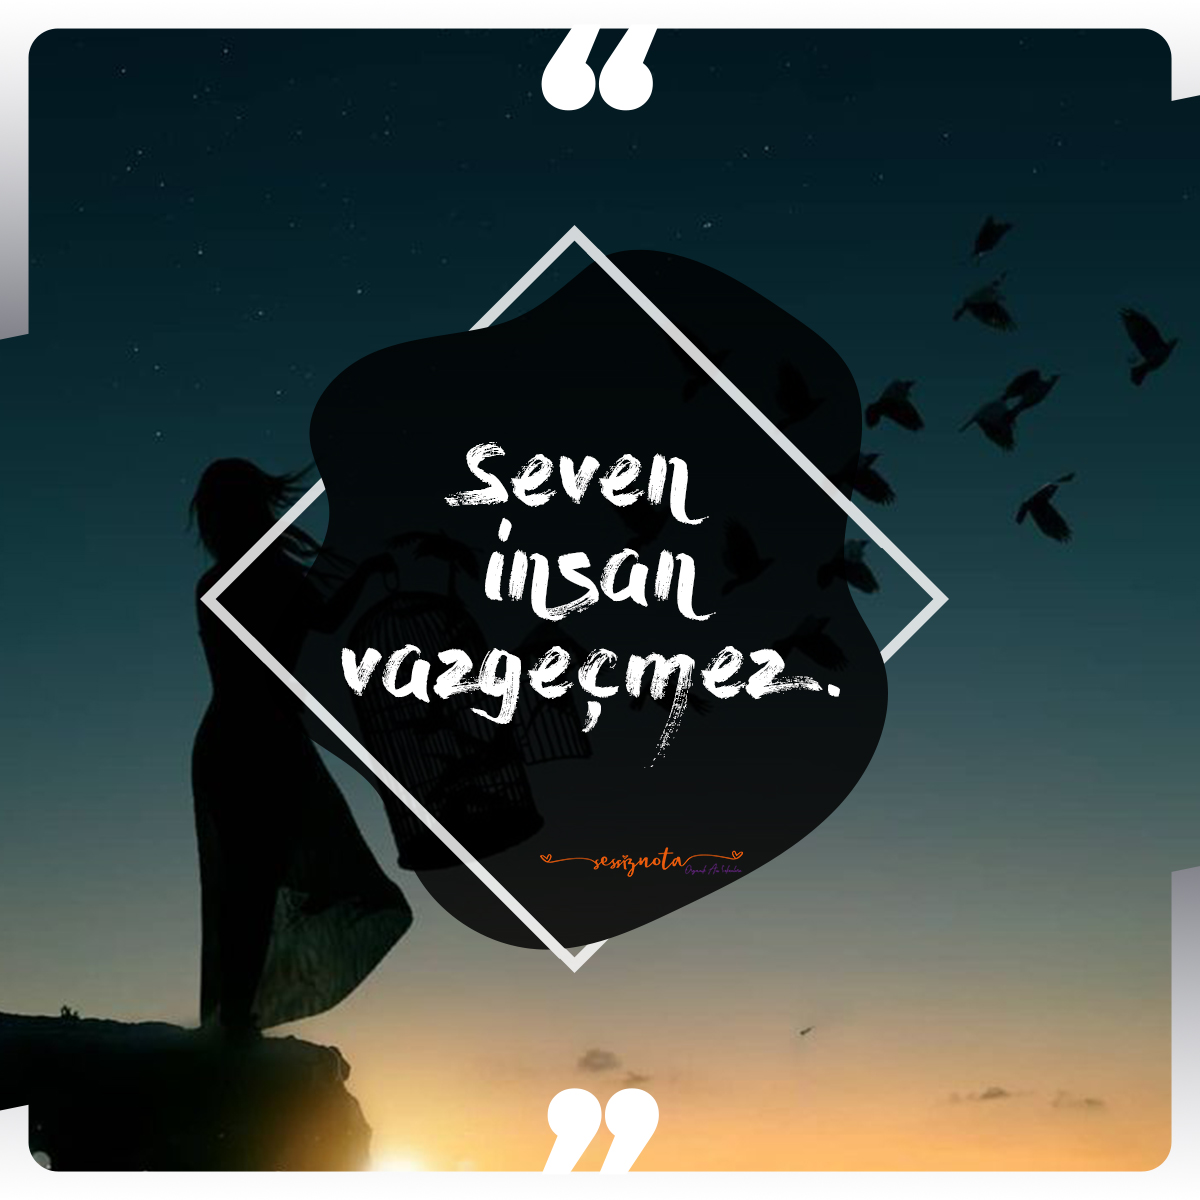 Seven insan vazgeçmez - Resimli Anlamlı Sözler - Etkileyici, Anlamlı Kısa Sözler, resimli-sozler